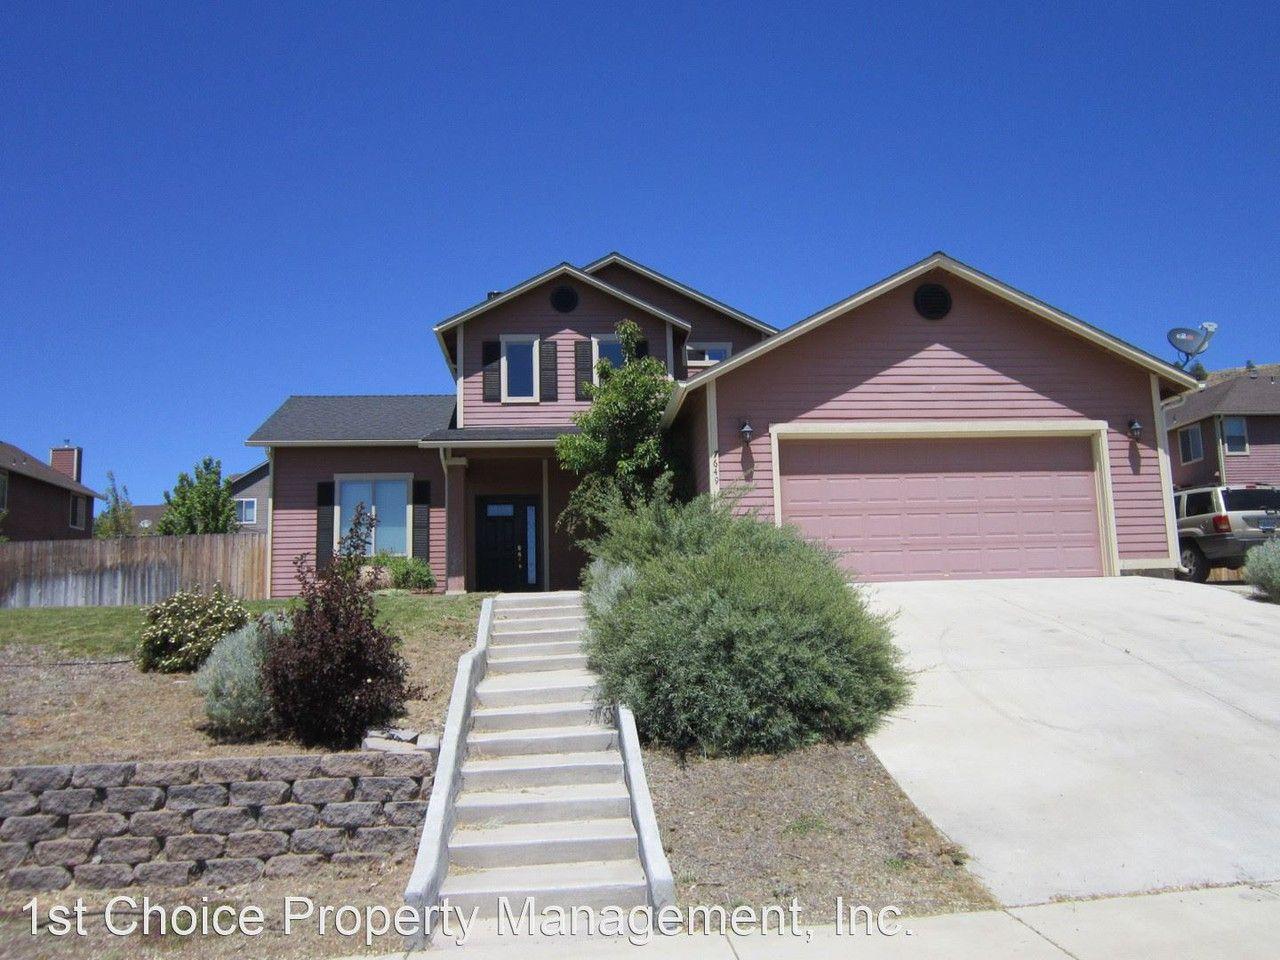 7649 Andrew Drive, Klamath Falls, OR 97603 3 Bedroom House ...